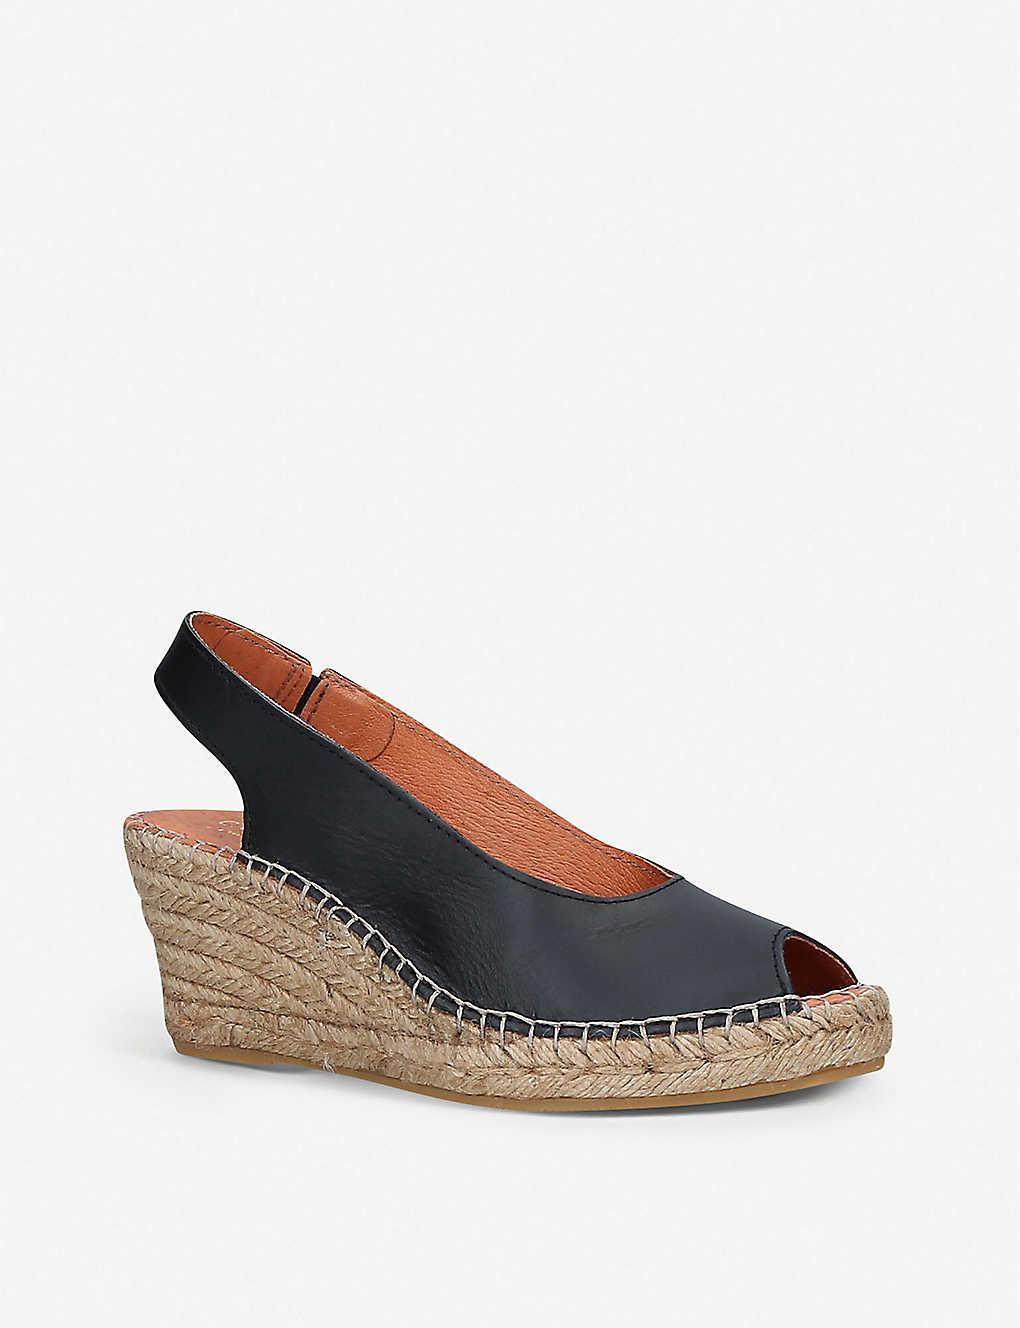 15b4194e4 CARVELA COMFORT - Sharon leather slingback wedge sandals ...